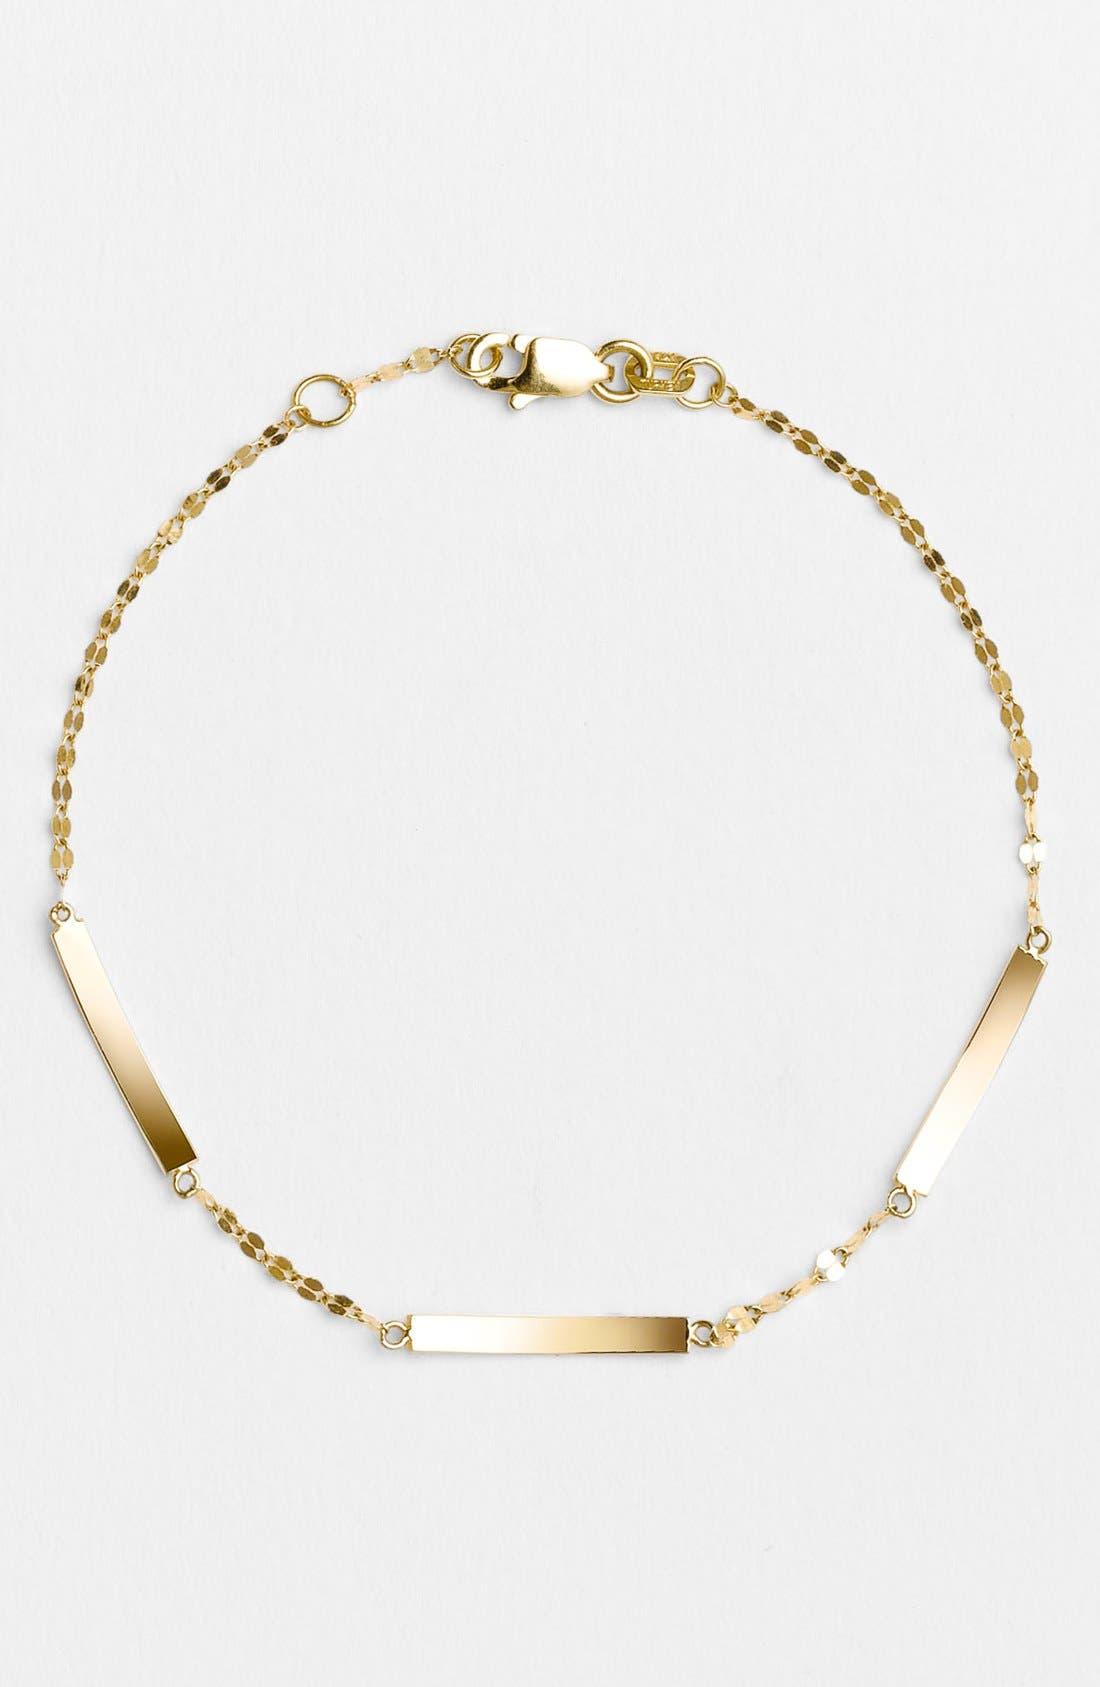 Alternate Image 1 Selected - Lana Jewelry Bar Station Bracelet